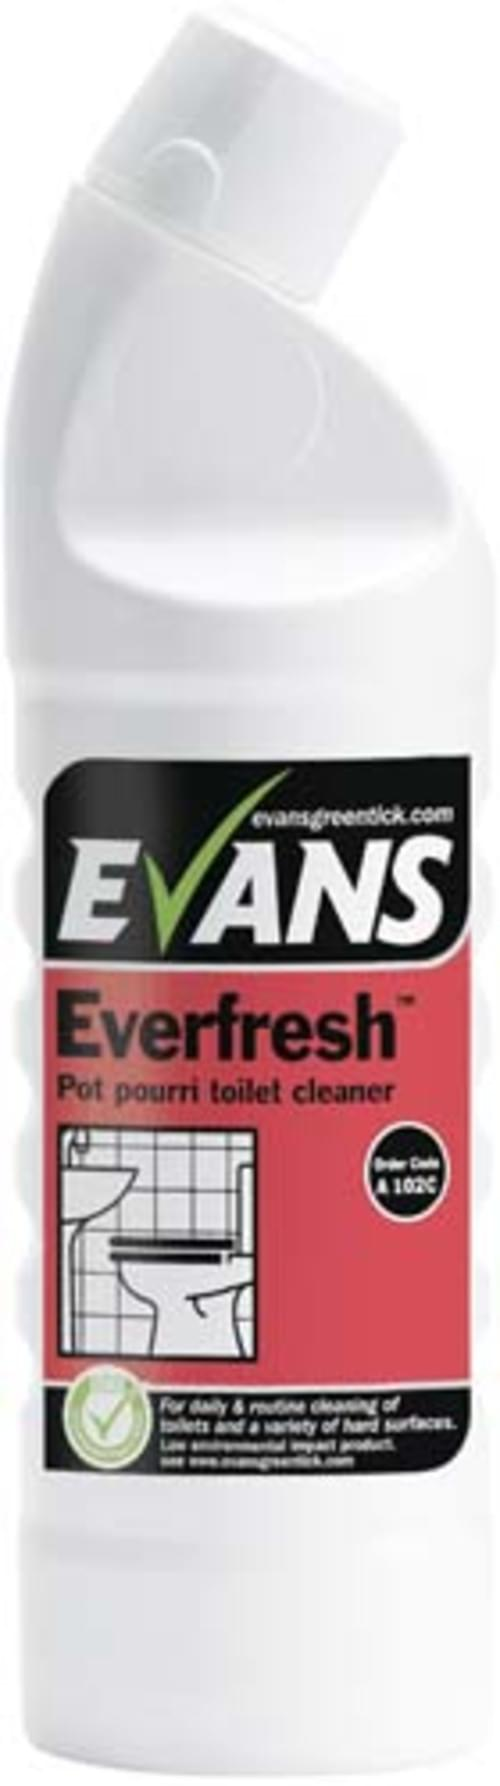 Evans Vanodine Toilet and Washroom Cleaner 6 x 1 litre